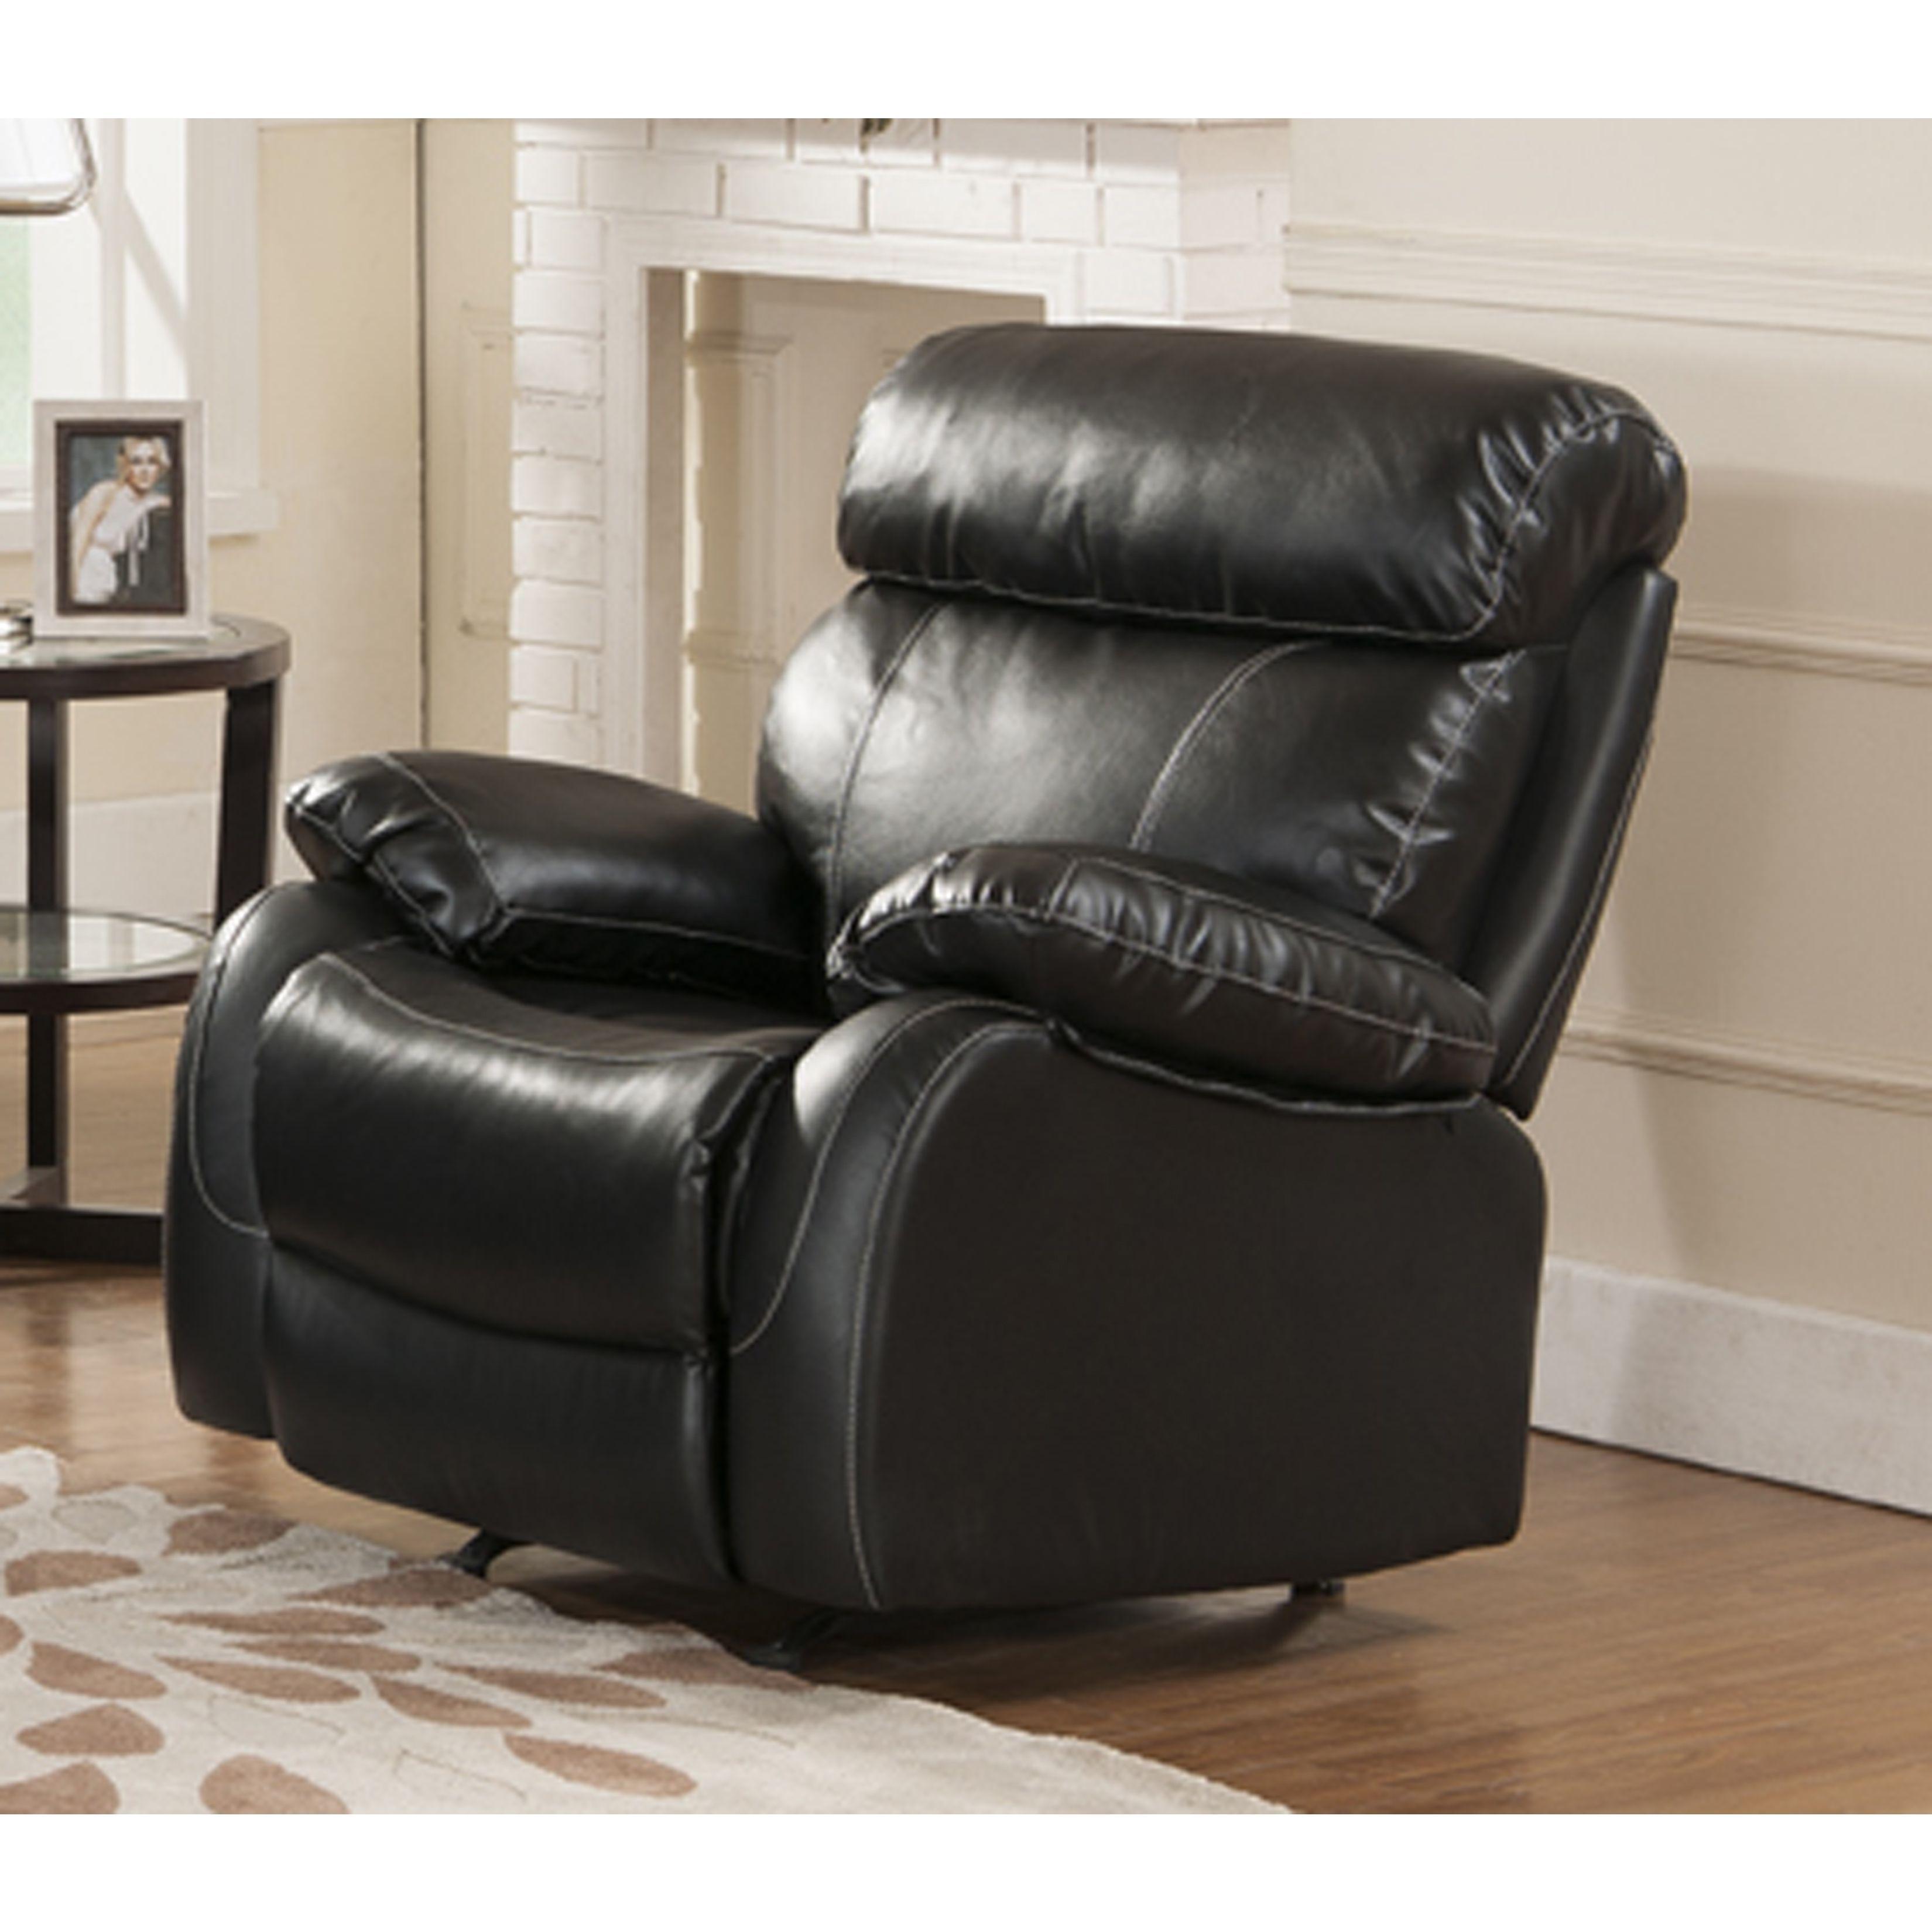 Amazing Barcelona Black Leather Rocking Recliner Chair Black Machost Co Dining Chair Design Ideas Machostcouk